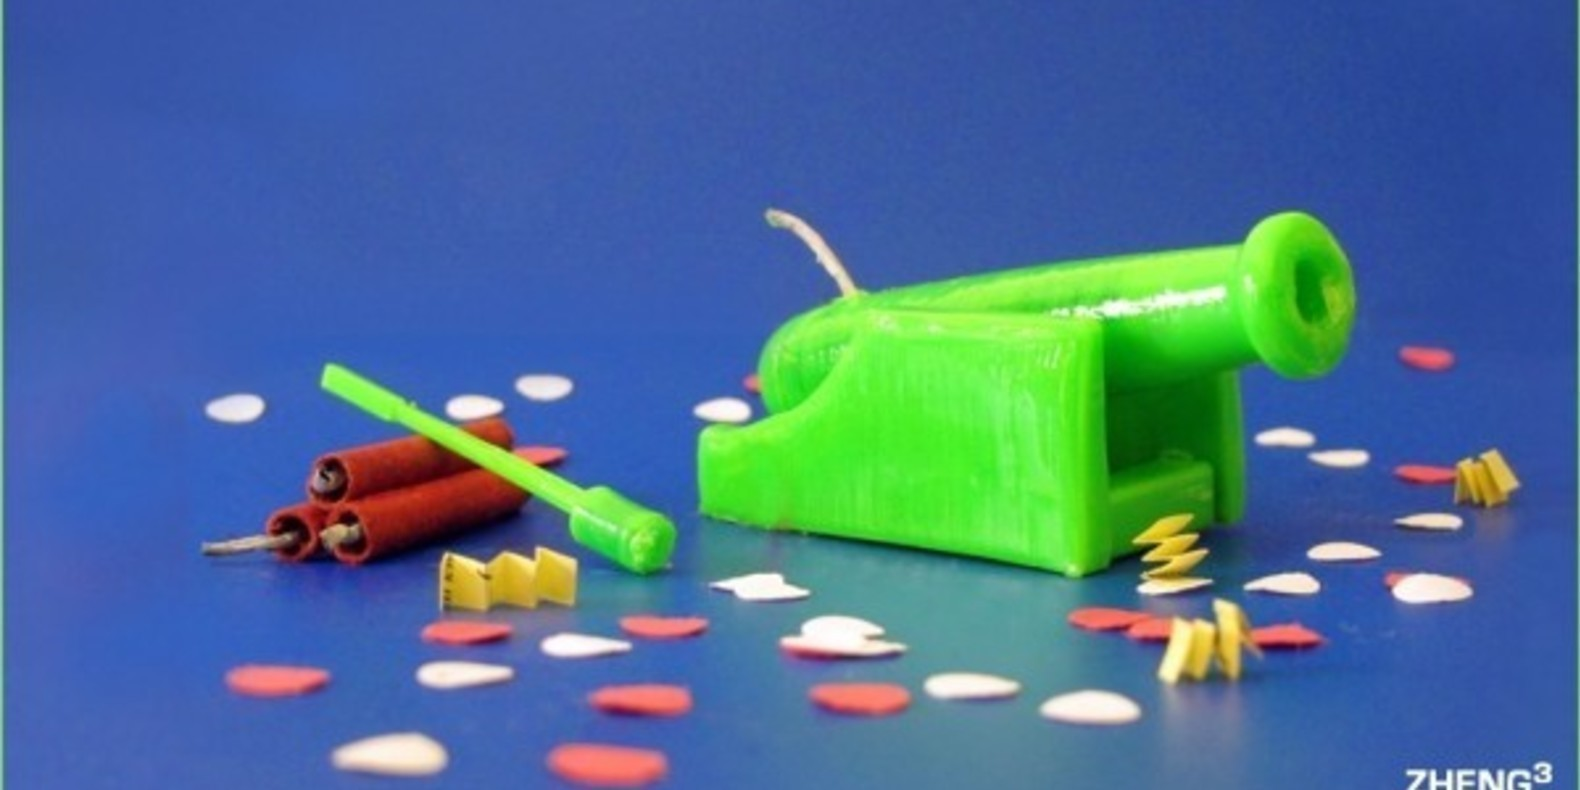 http://fichier3d.fr/wp-content/uploads/2014/01/zheng3-seej-the-forge-fichier-3d-cults-jeu-plateau-catapulte-arme-weapon-block-impression-3d-3D-printing-fun-games-13-e1389265390755.jpg